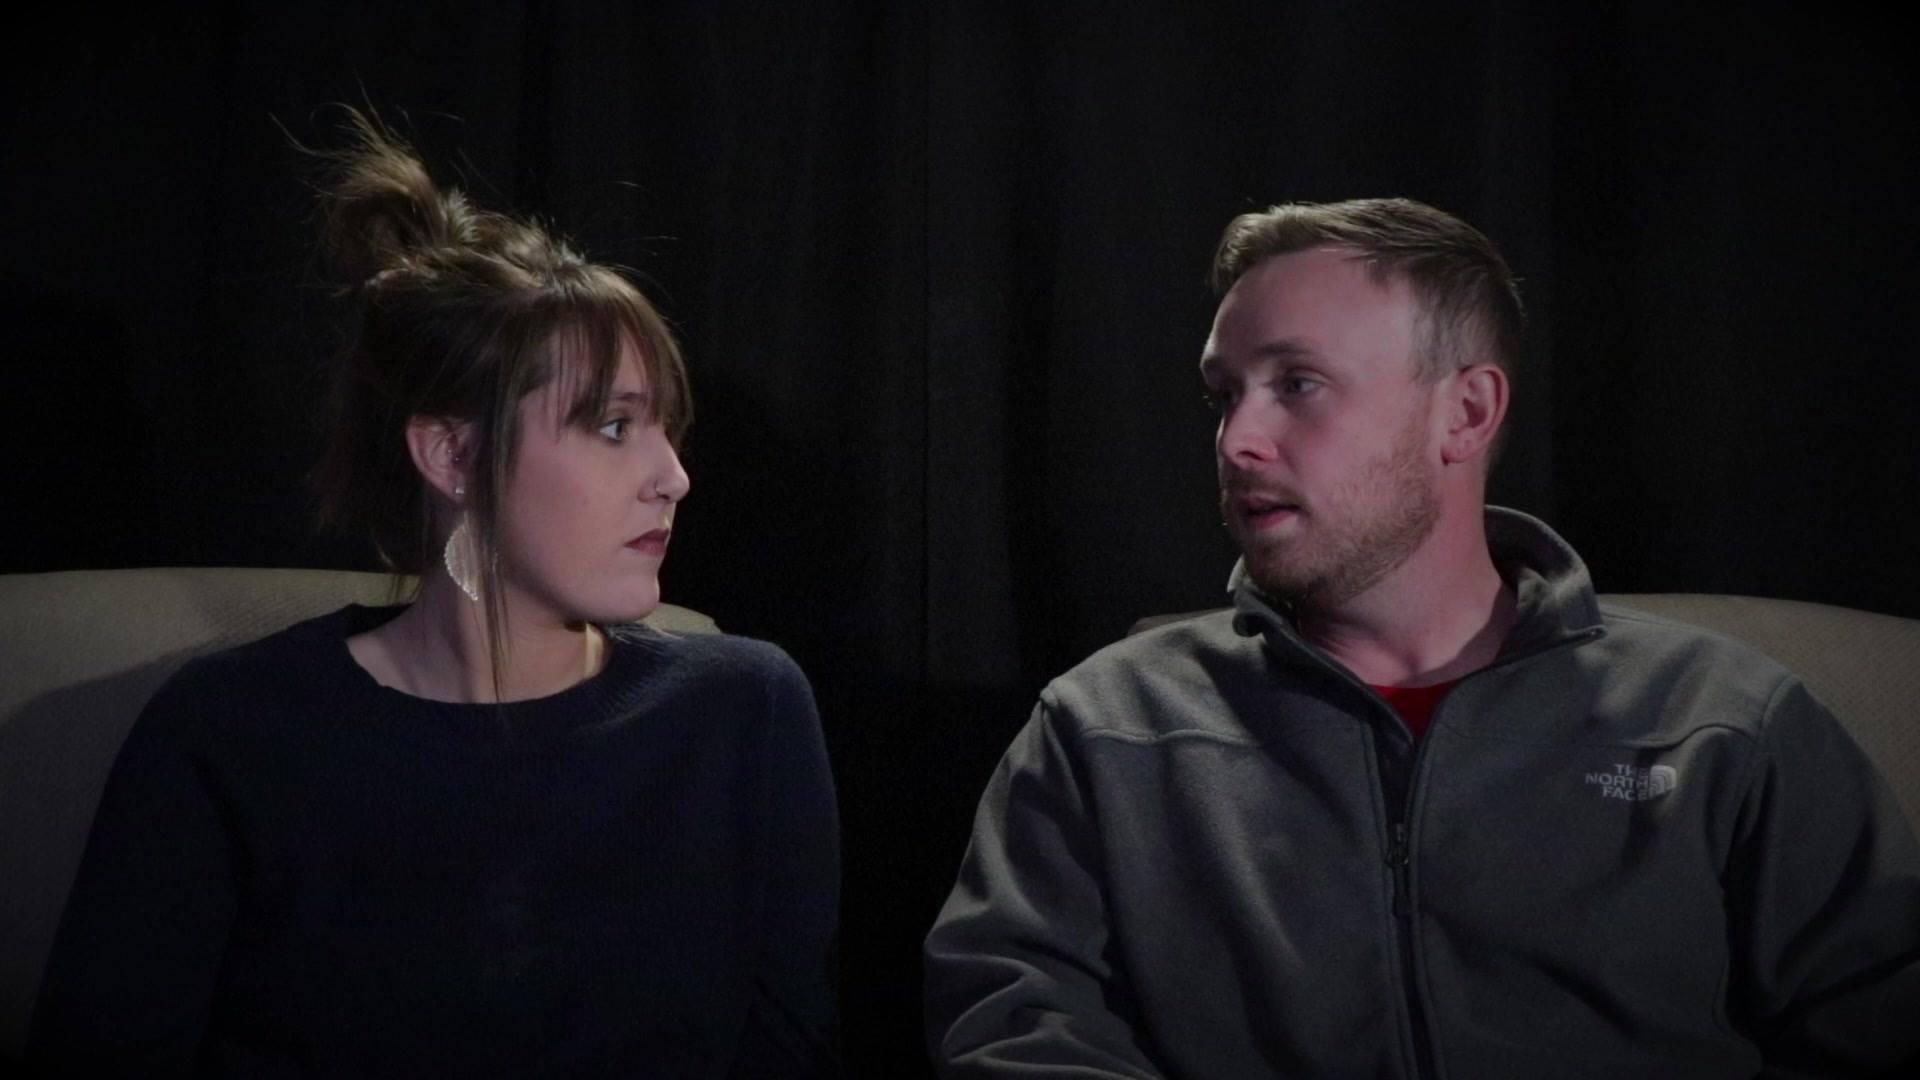 Joey & Stephen's Story